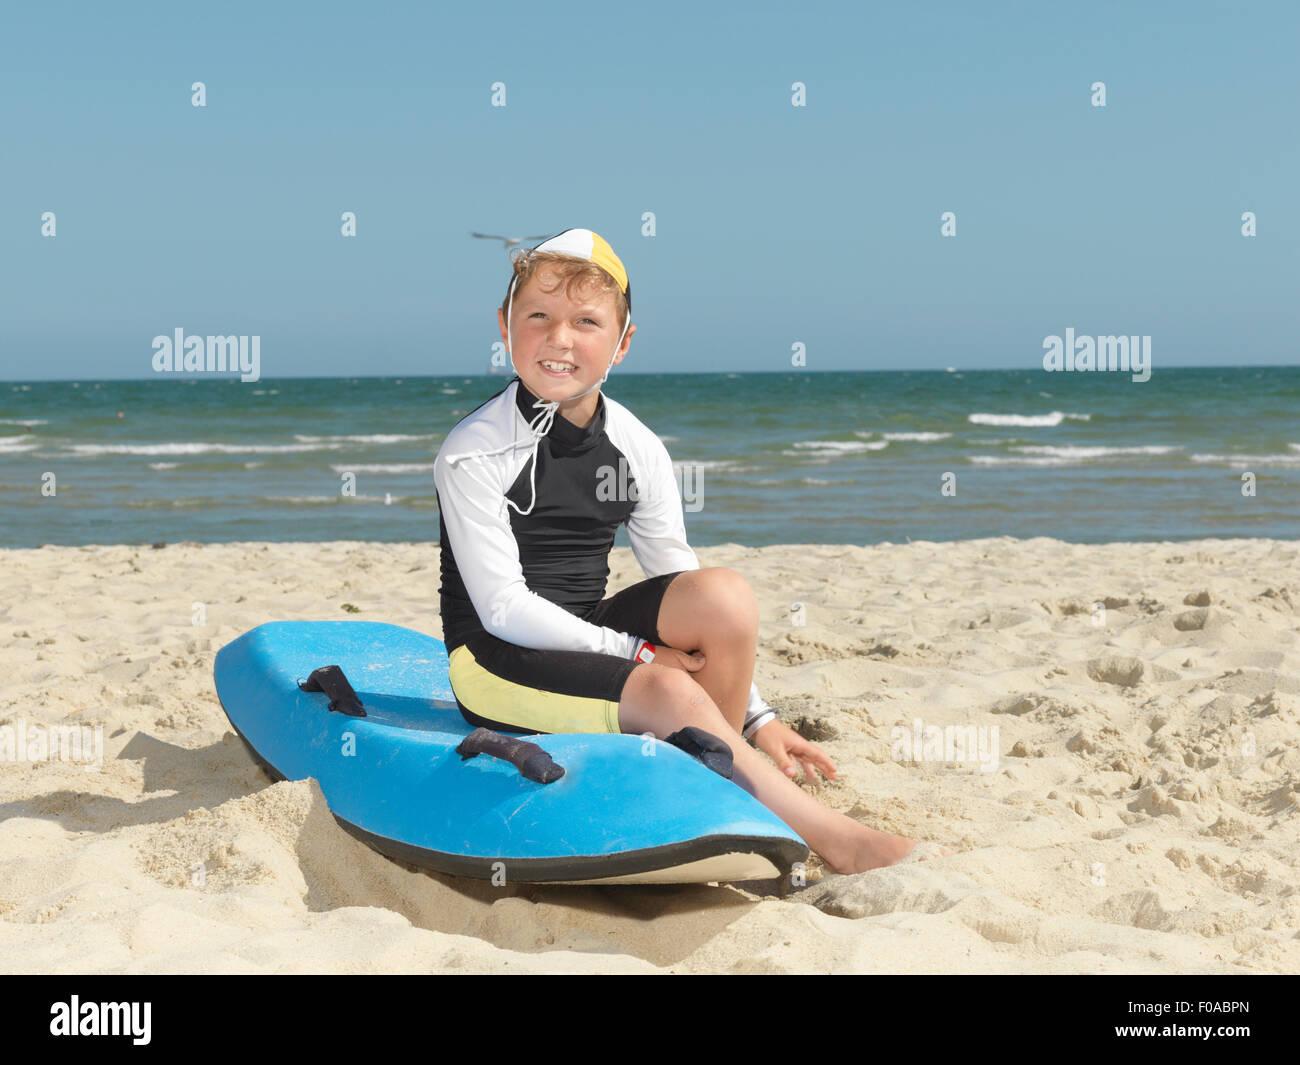 Portrait of boy nipper (child surf life savers) on surfboard at beach, Altona, Melbourne, Australia - Stock Image